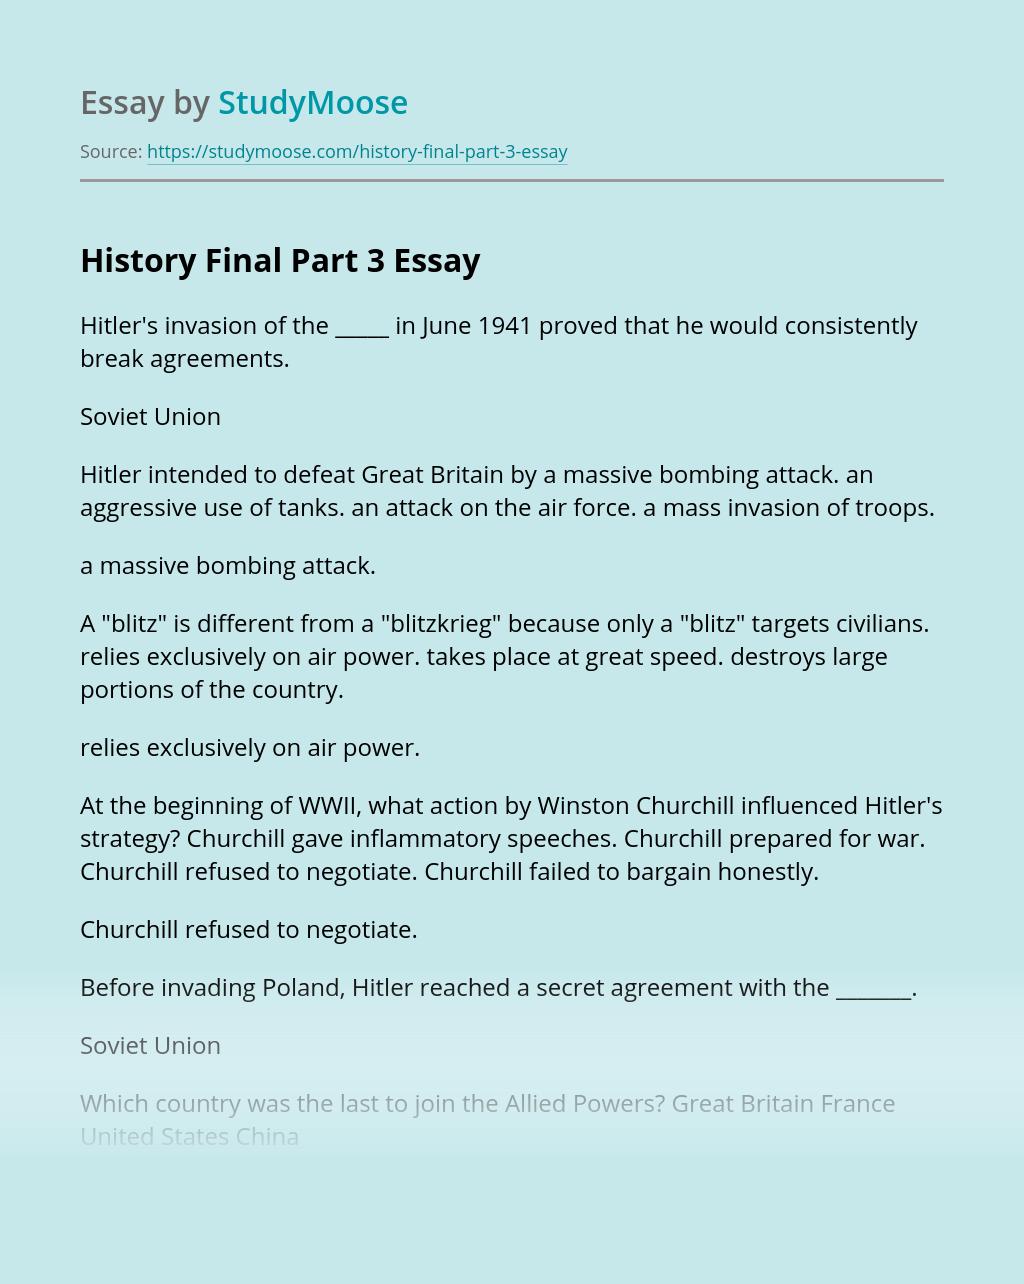 History Final Part 3